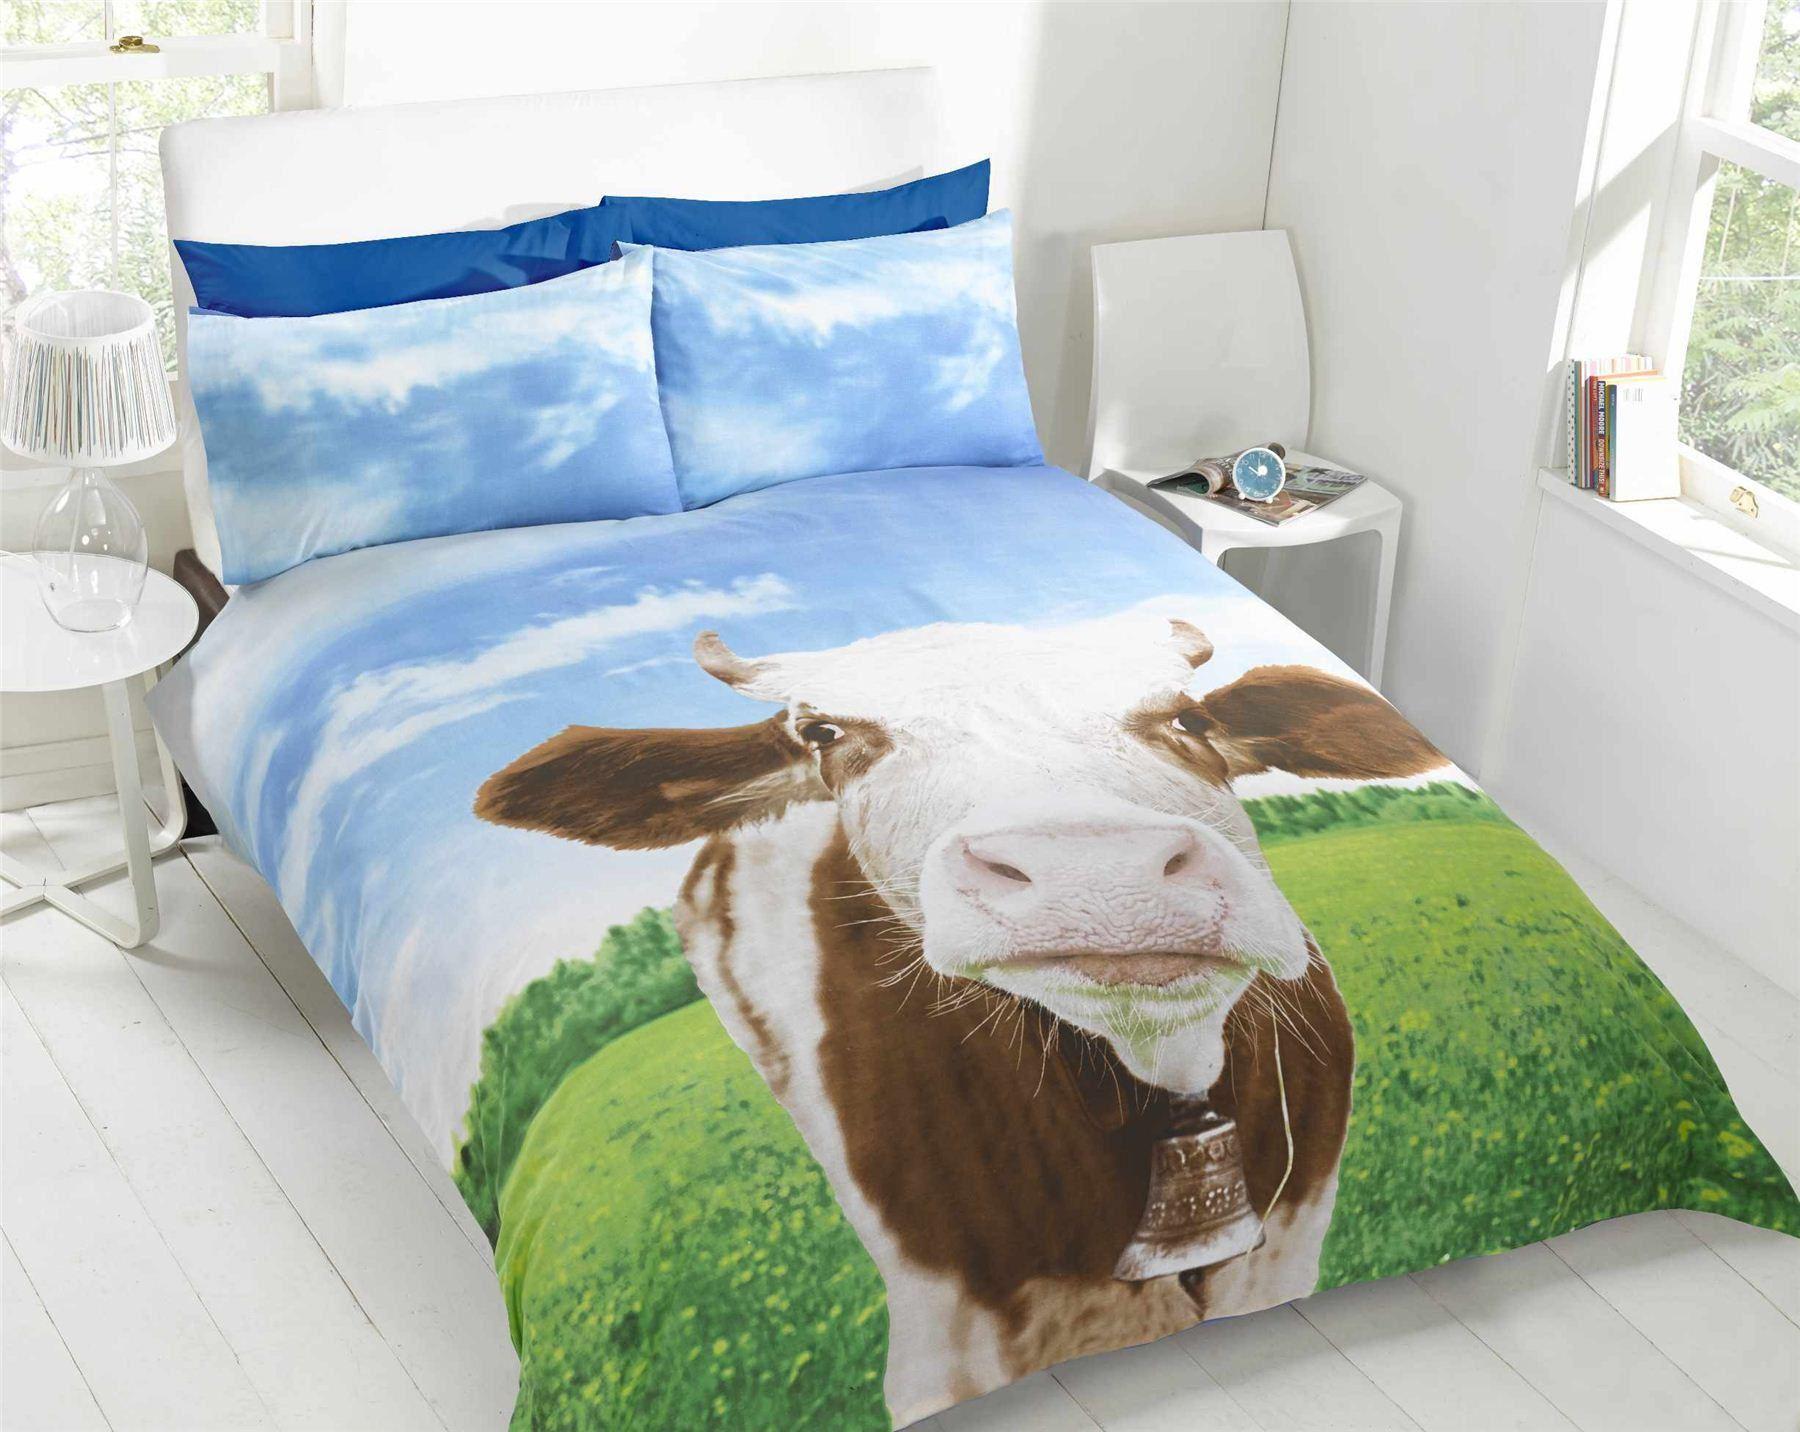 Daisy Cow Bedding Photo Print Novelty Duvet Cover Bright